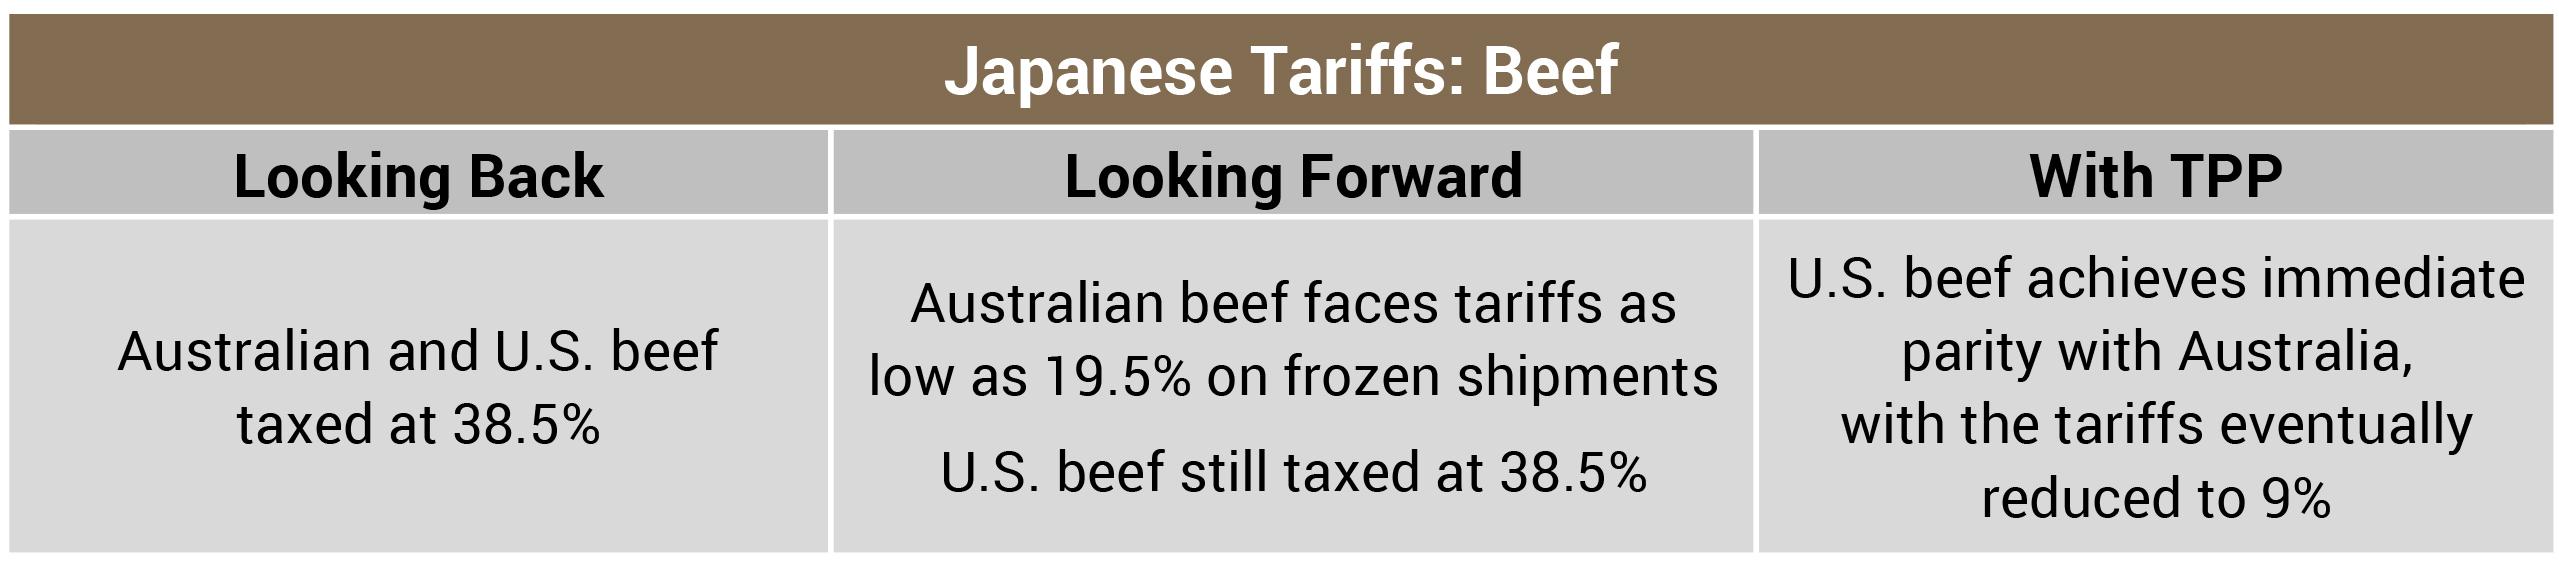 Japanese Tariffs Beef